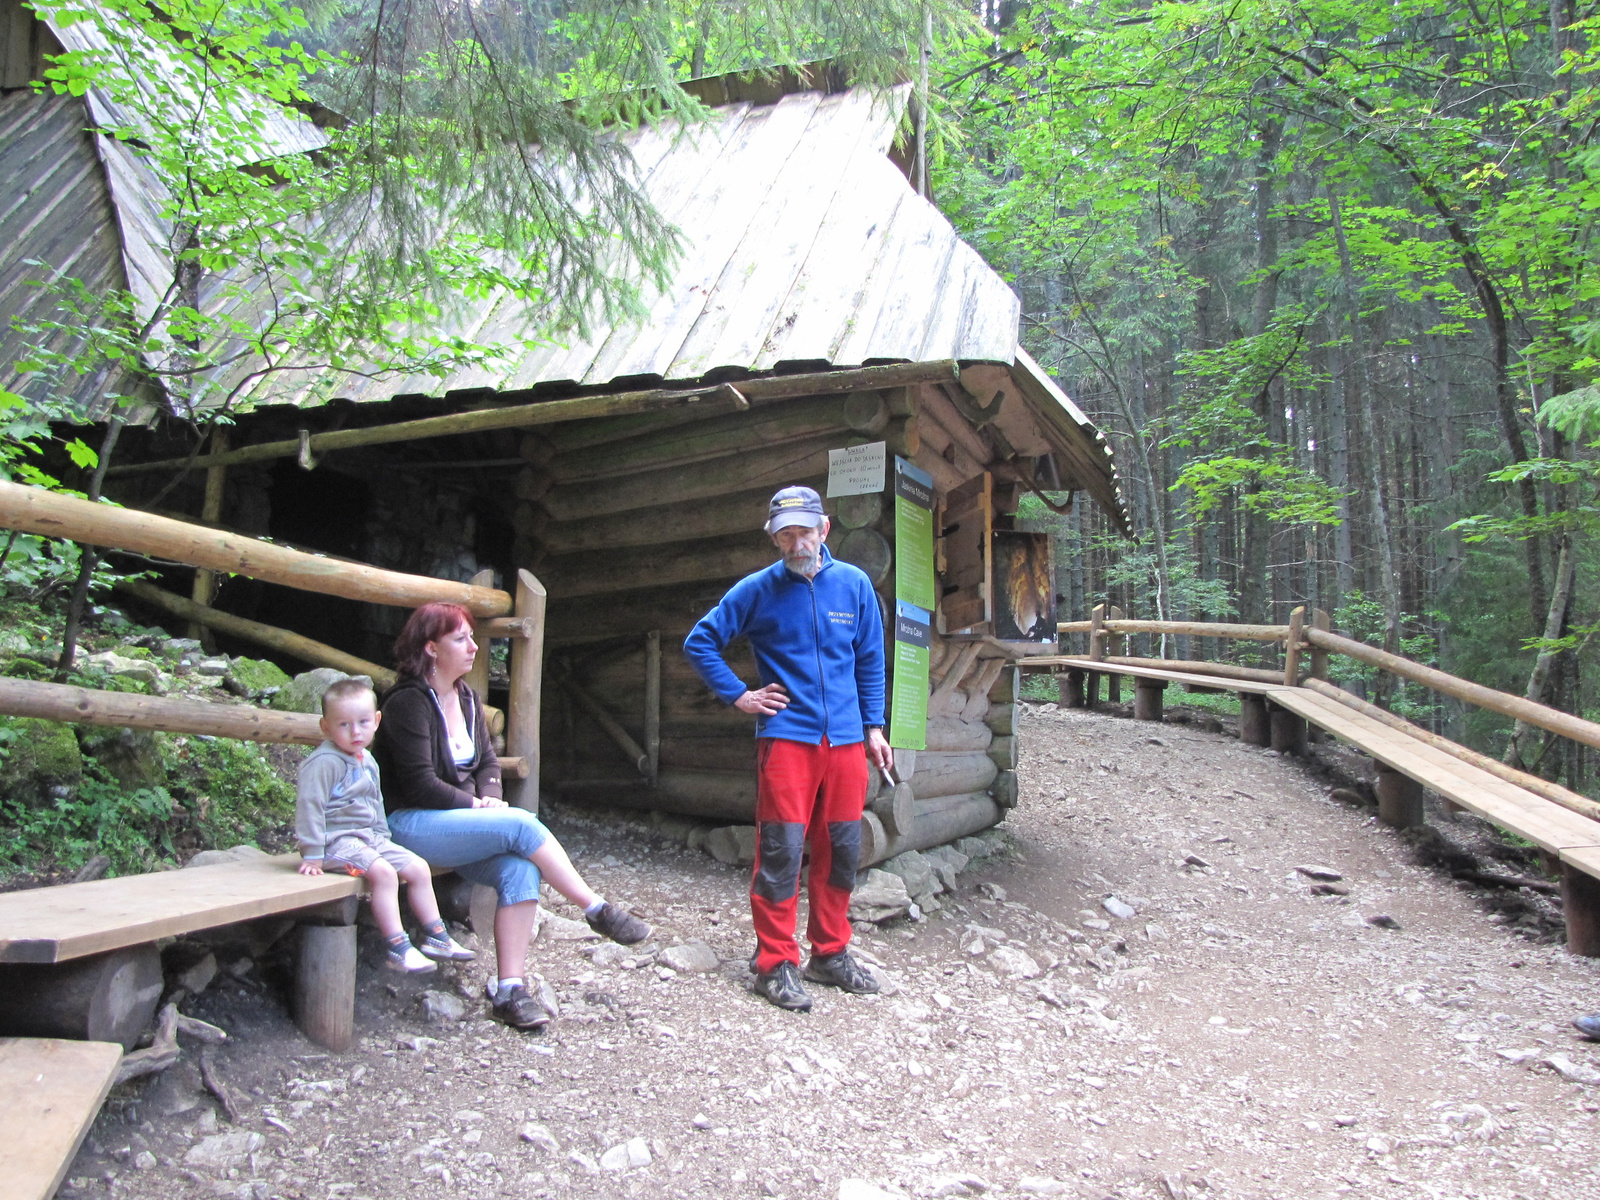 Tátra Nemzeti Park, Dolina Kościeliska, a Mroźna barlang bejárat